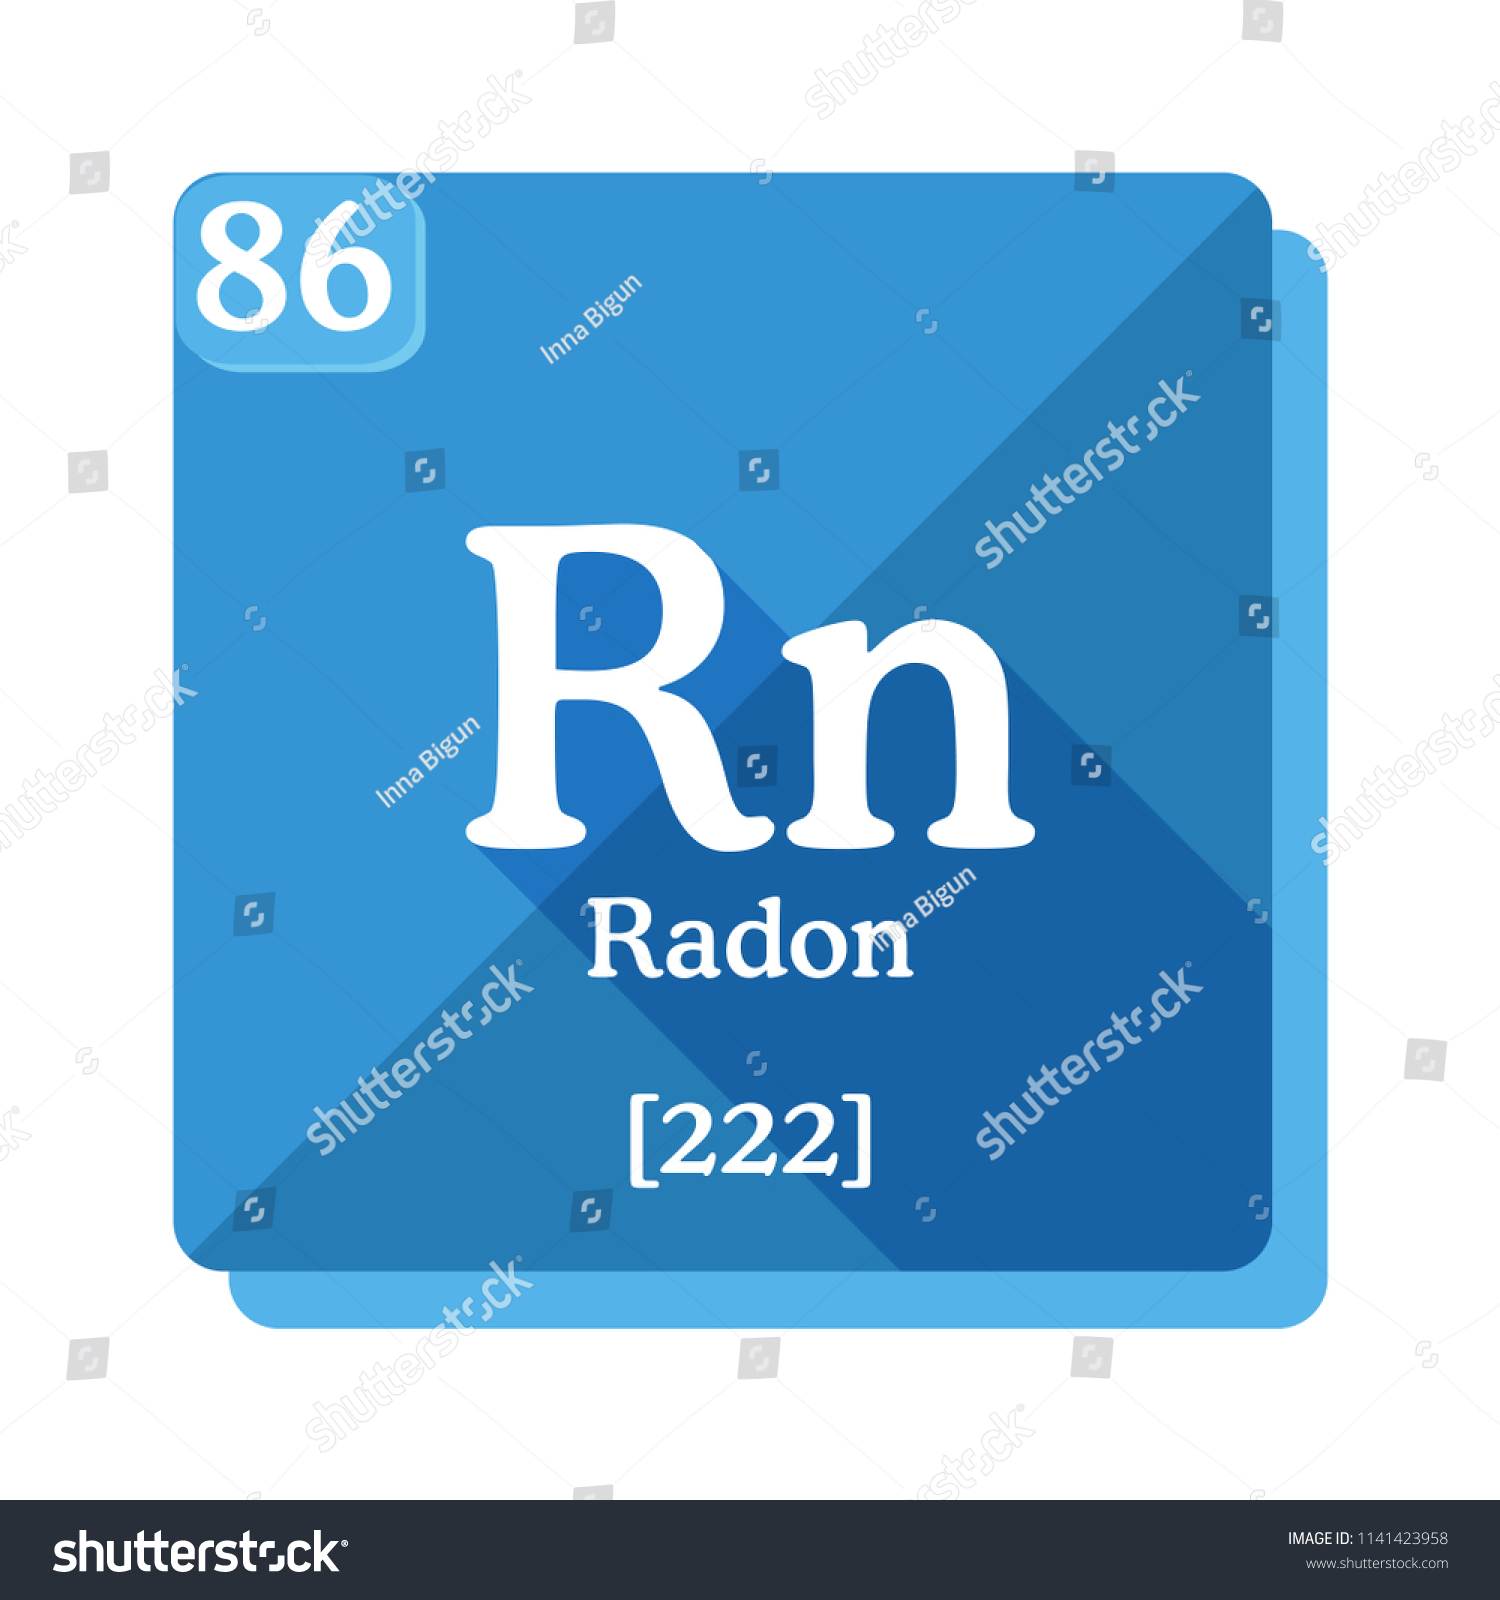 Radon Rn Element Periodic Table Flat Stock Vector Royalty Free